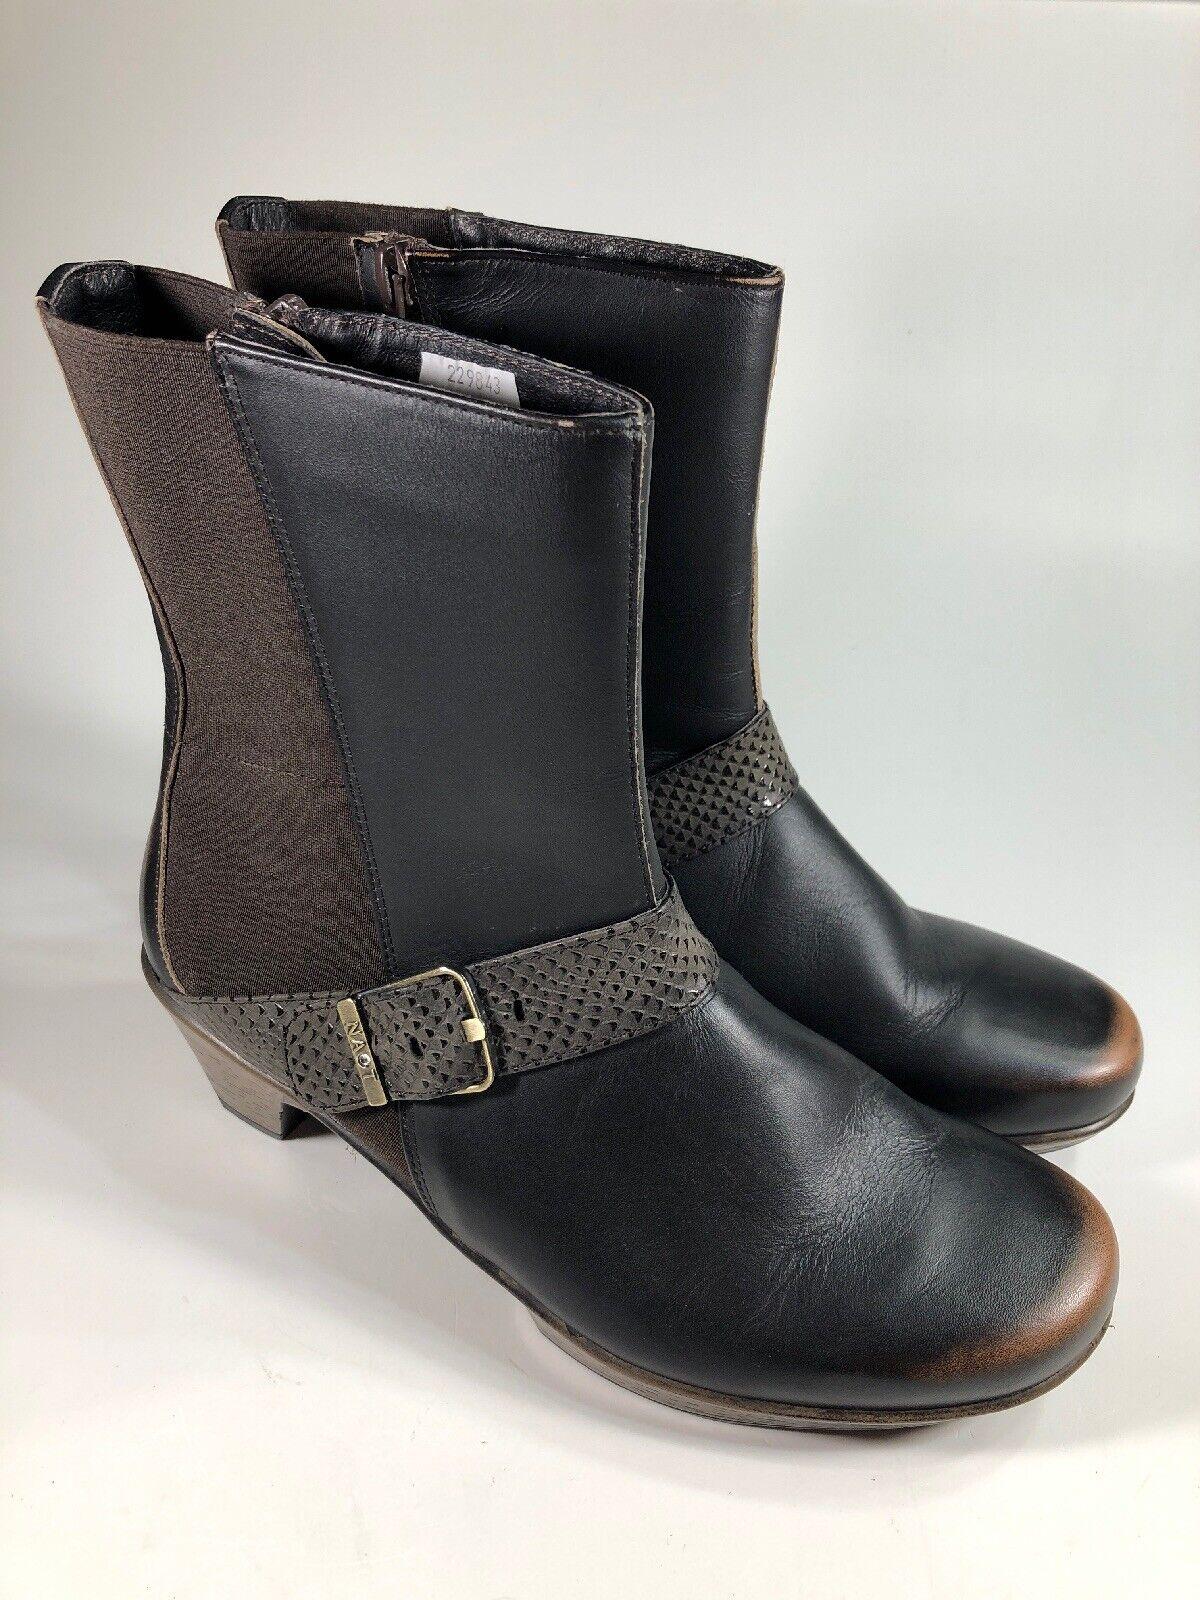 NAOT Nearly nuovo  225 Marronee Leather Buckle Slip On stivali donna Dimensione 9 M EU40